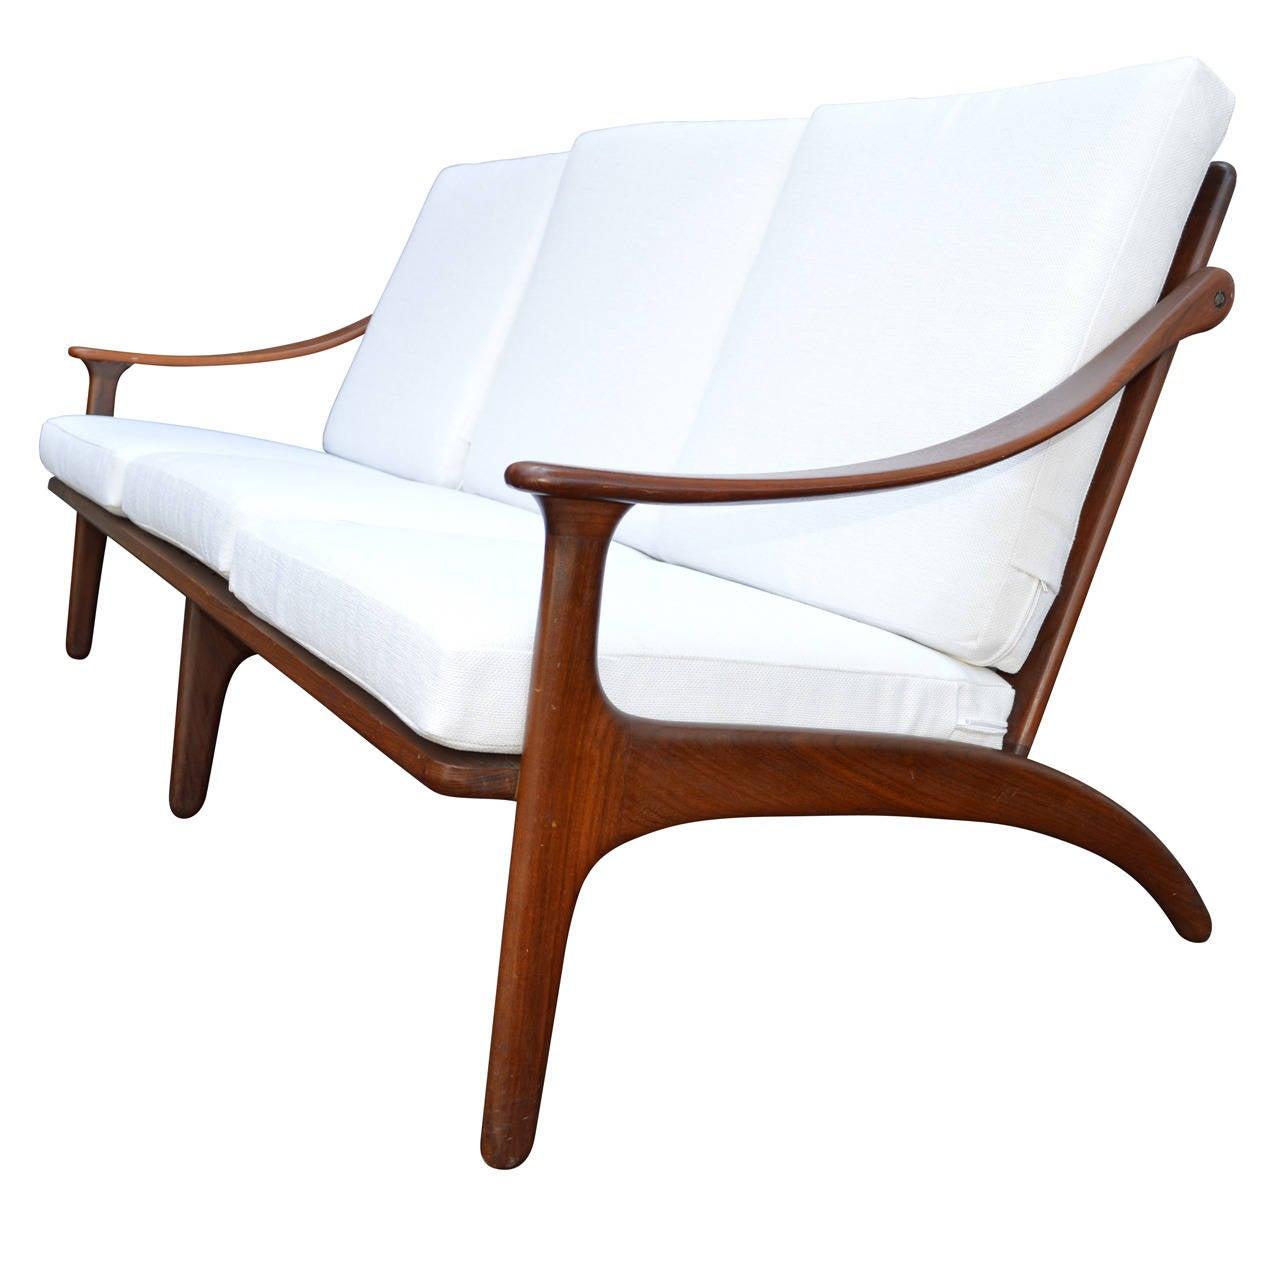 Mid-Century Sofa by Arne Hovmand Olesen